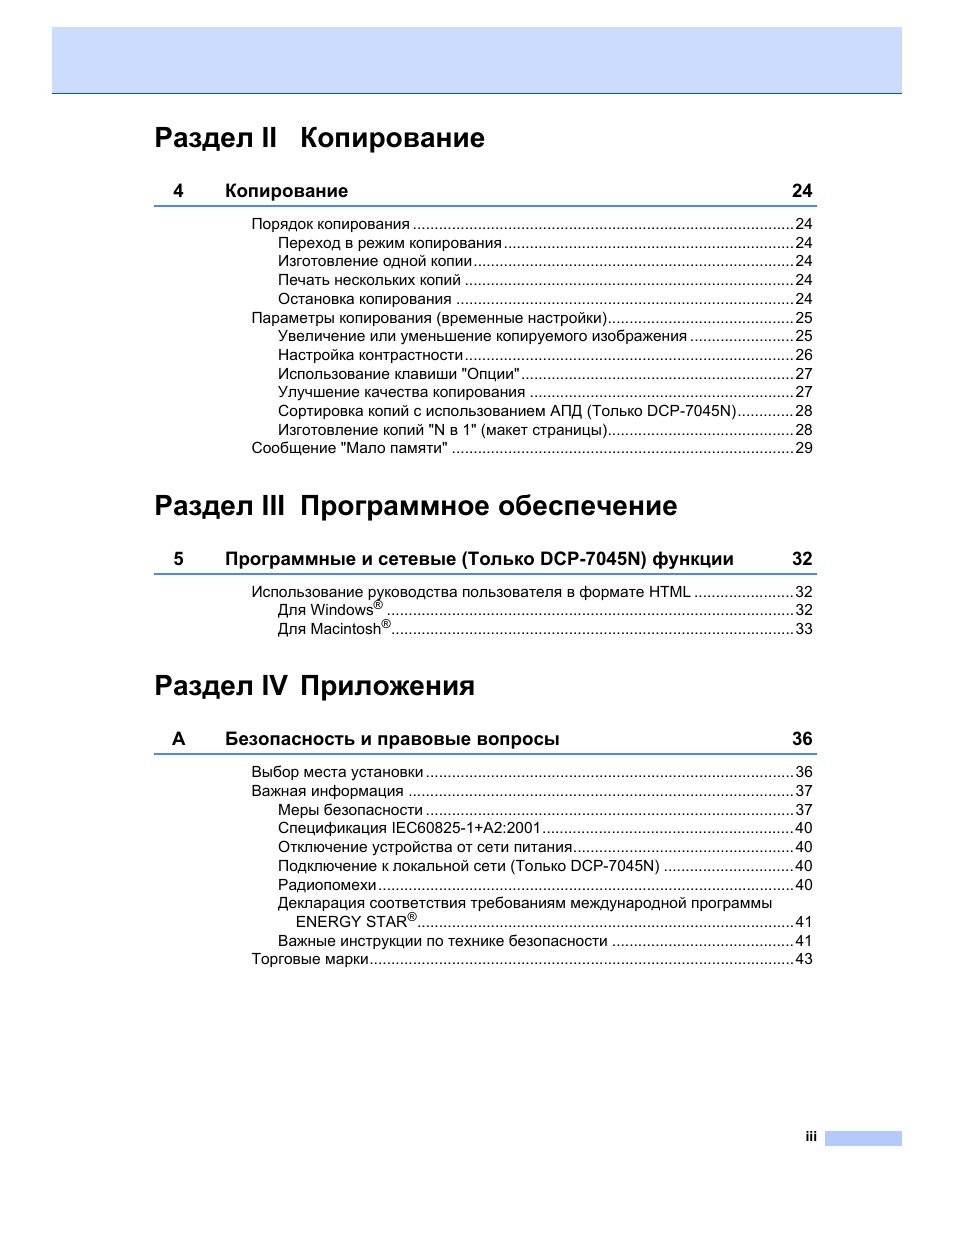 Раздел ii копирование, Раздел iii программное обеспечение, Раздел iv приложения